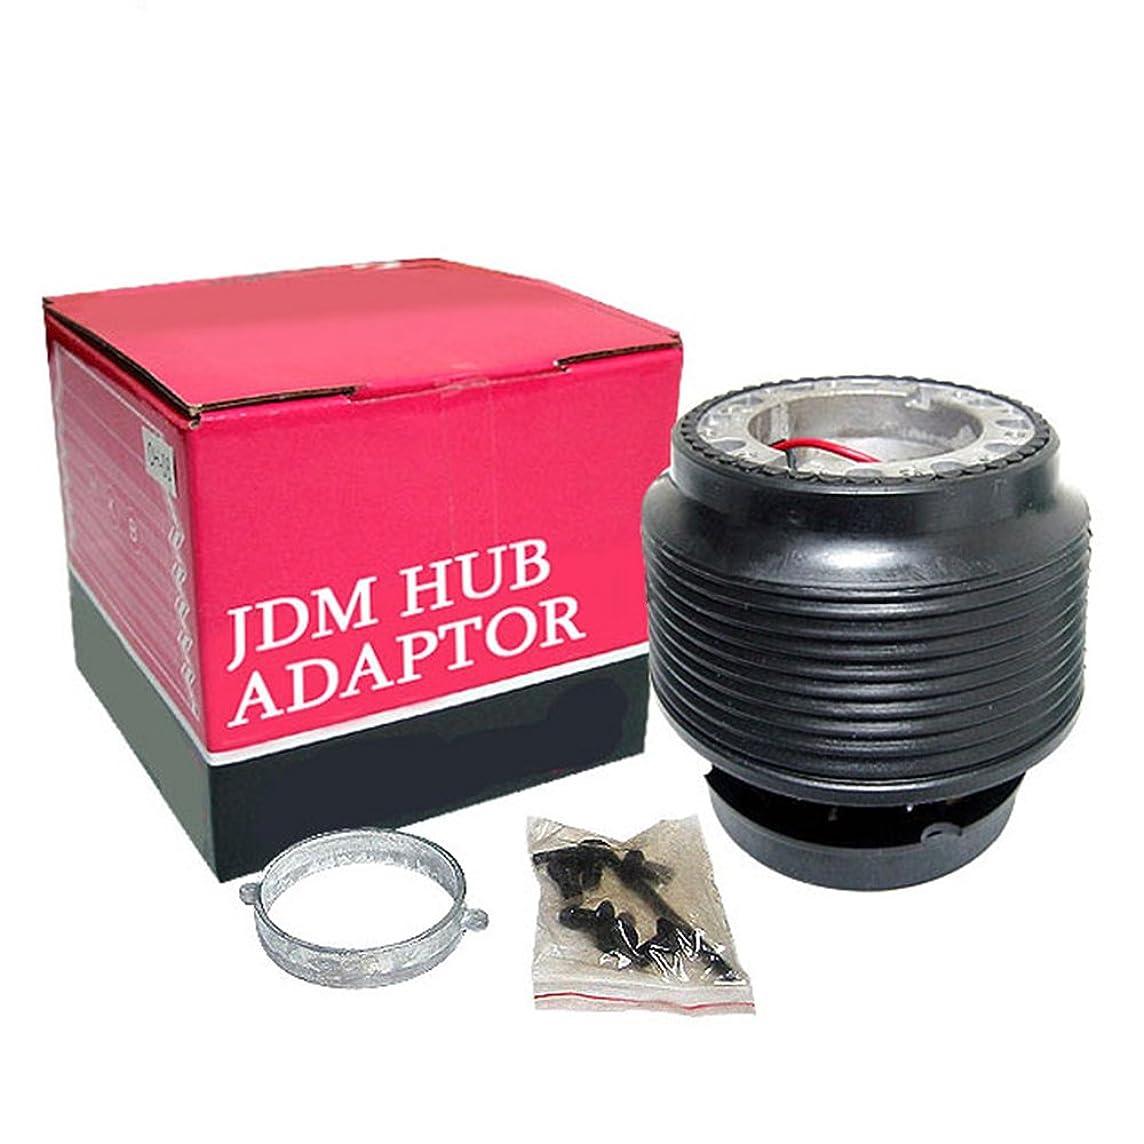 Hub Adapter Fits 1986-1991 Mazda RX7 | JDM Style Black Boss Kit by IKON MOTORSPORTS | 1991 1992 1993 1994 1995 1996